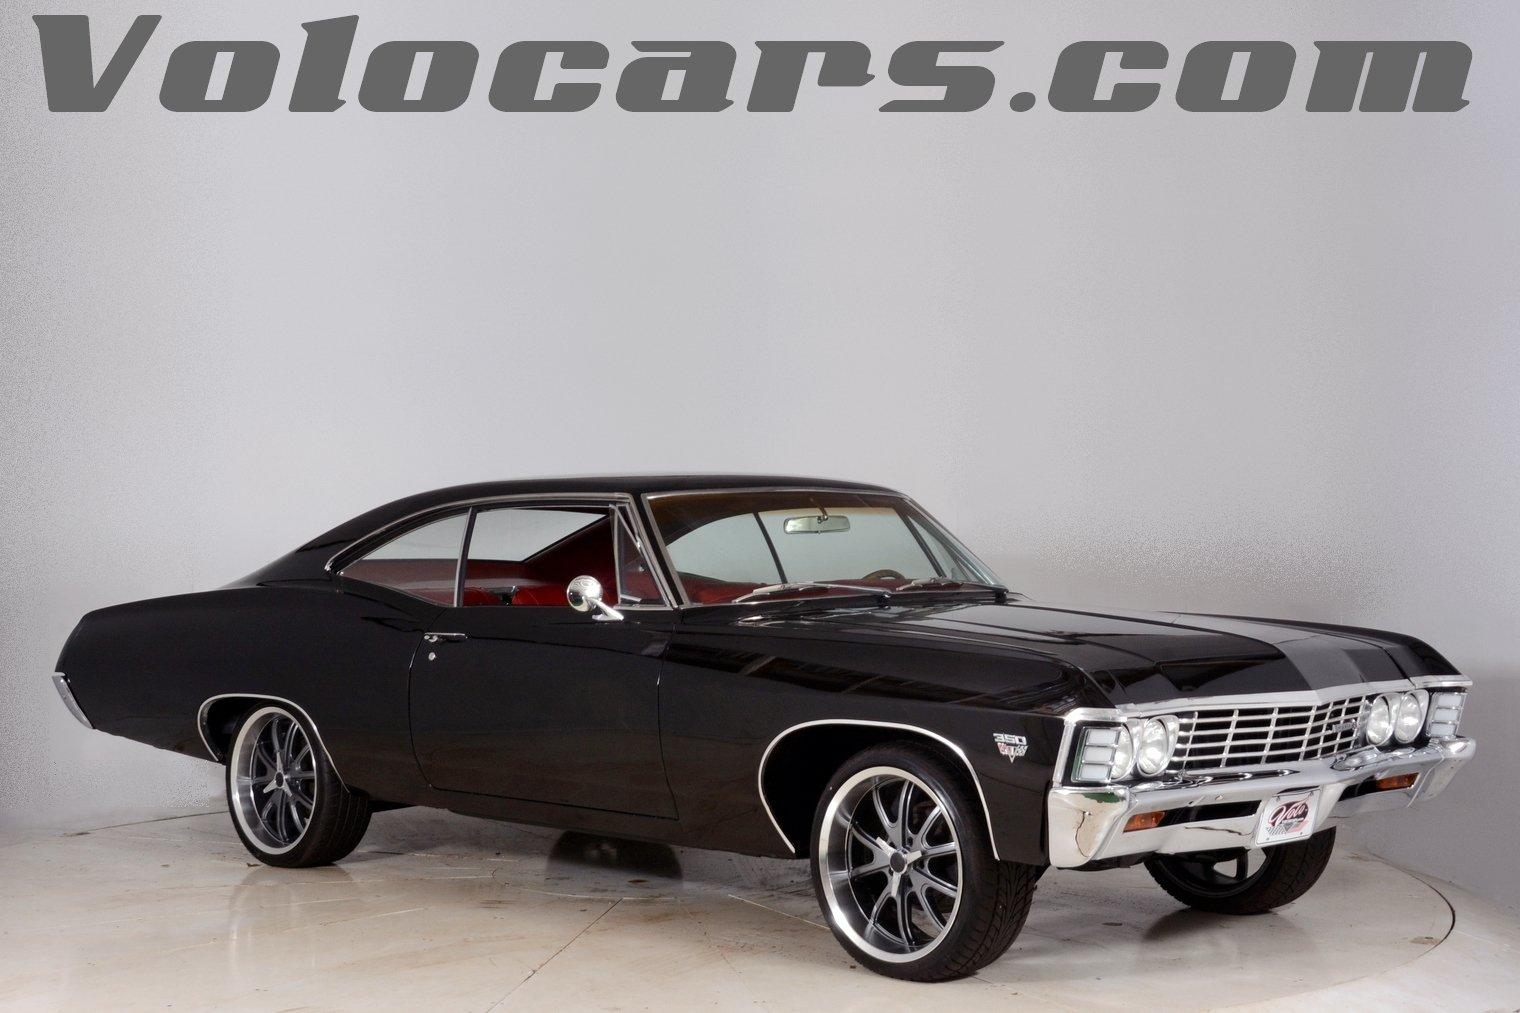 1967 Chevrolet Impala Volo Auto Museum